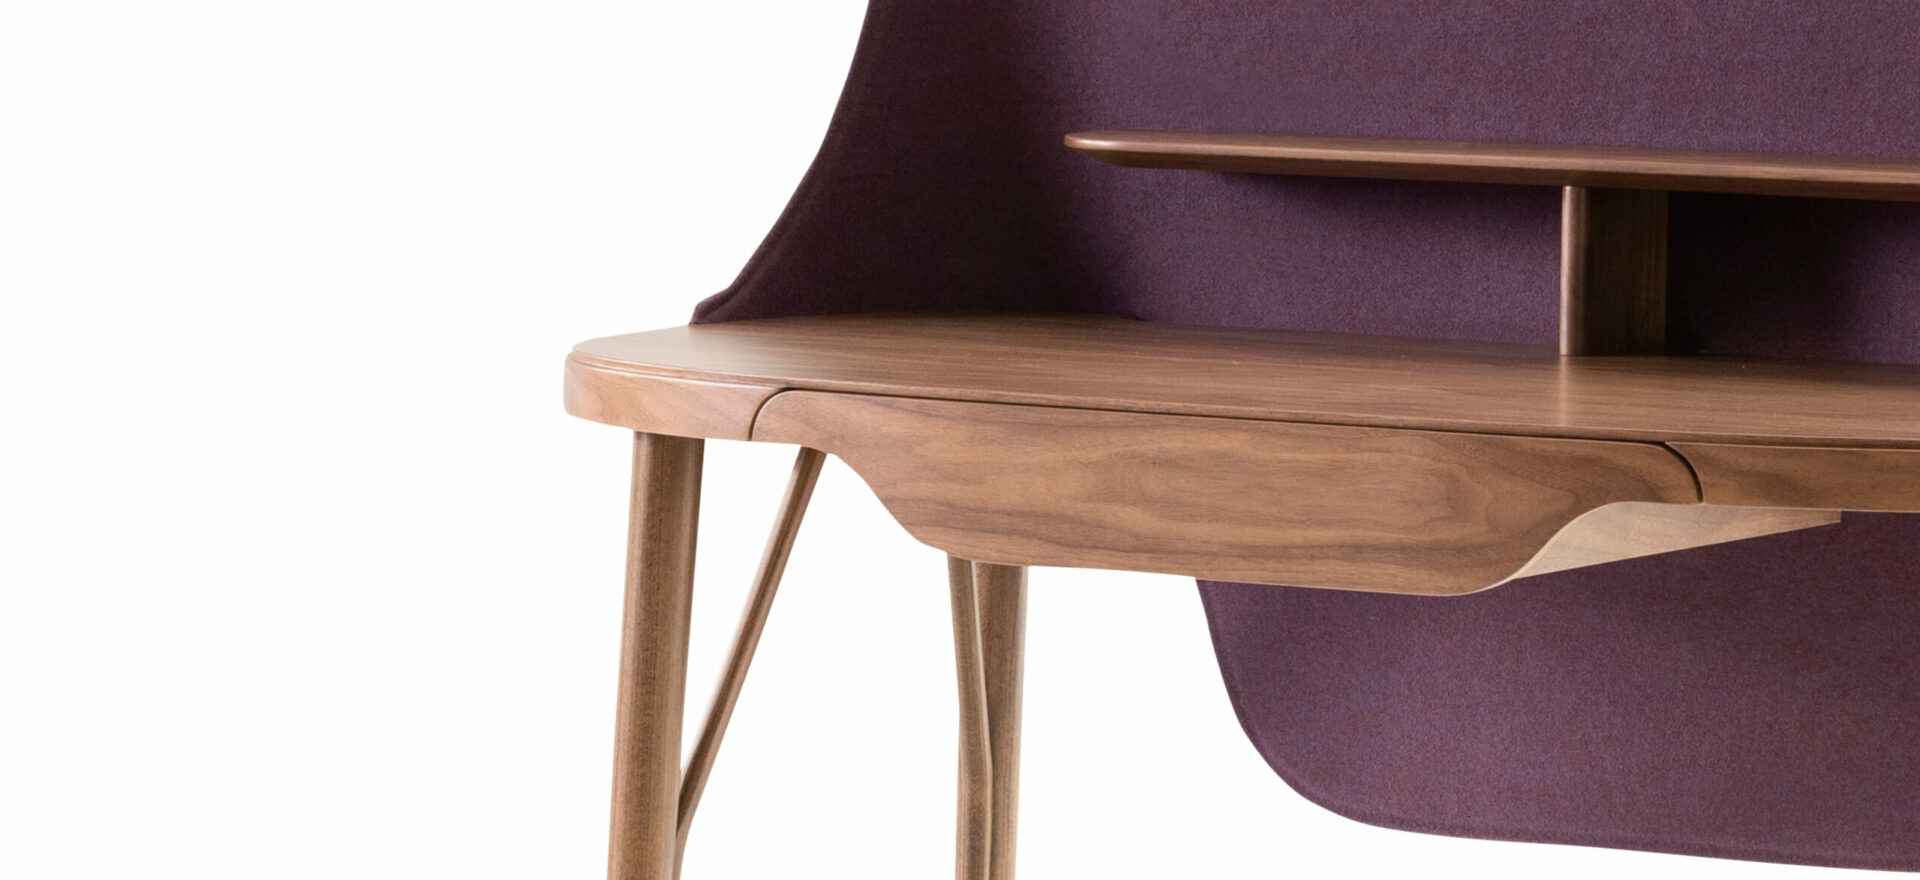 LUNEDI_Addo_workstation_home office_details_Mario Trimarchi Design4